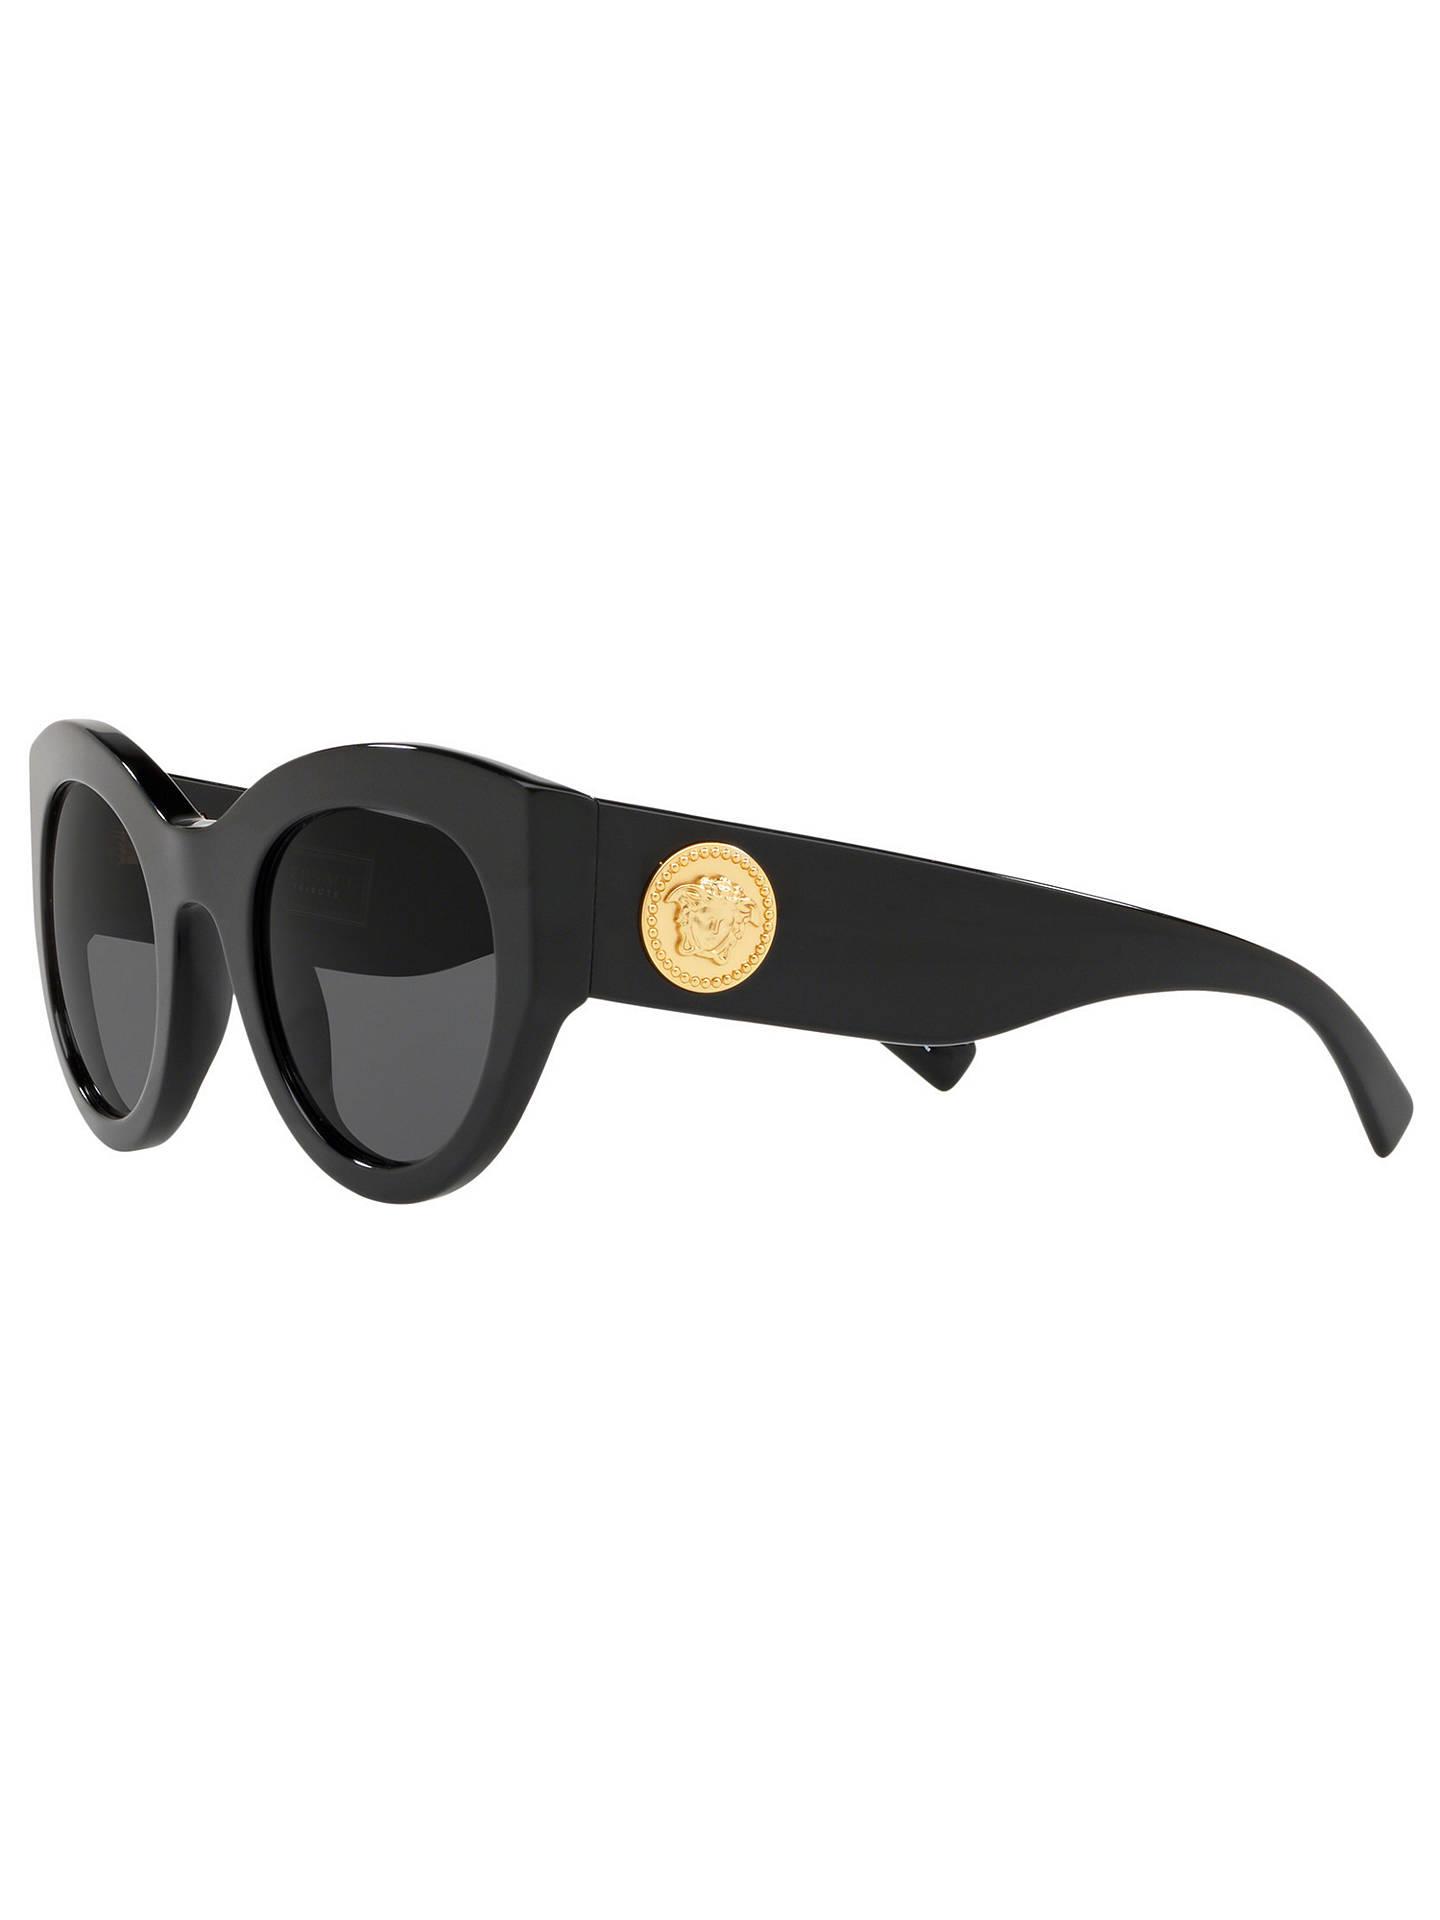 ad0c94dfbba Versace VE4353 Women s Cat s Eye Sunglasses at John Lewis   Partners